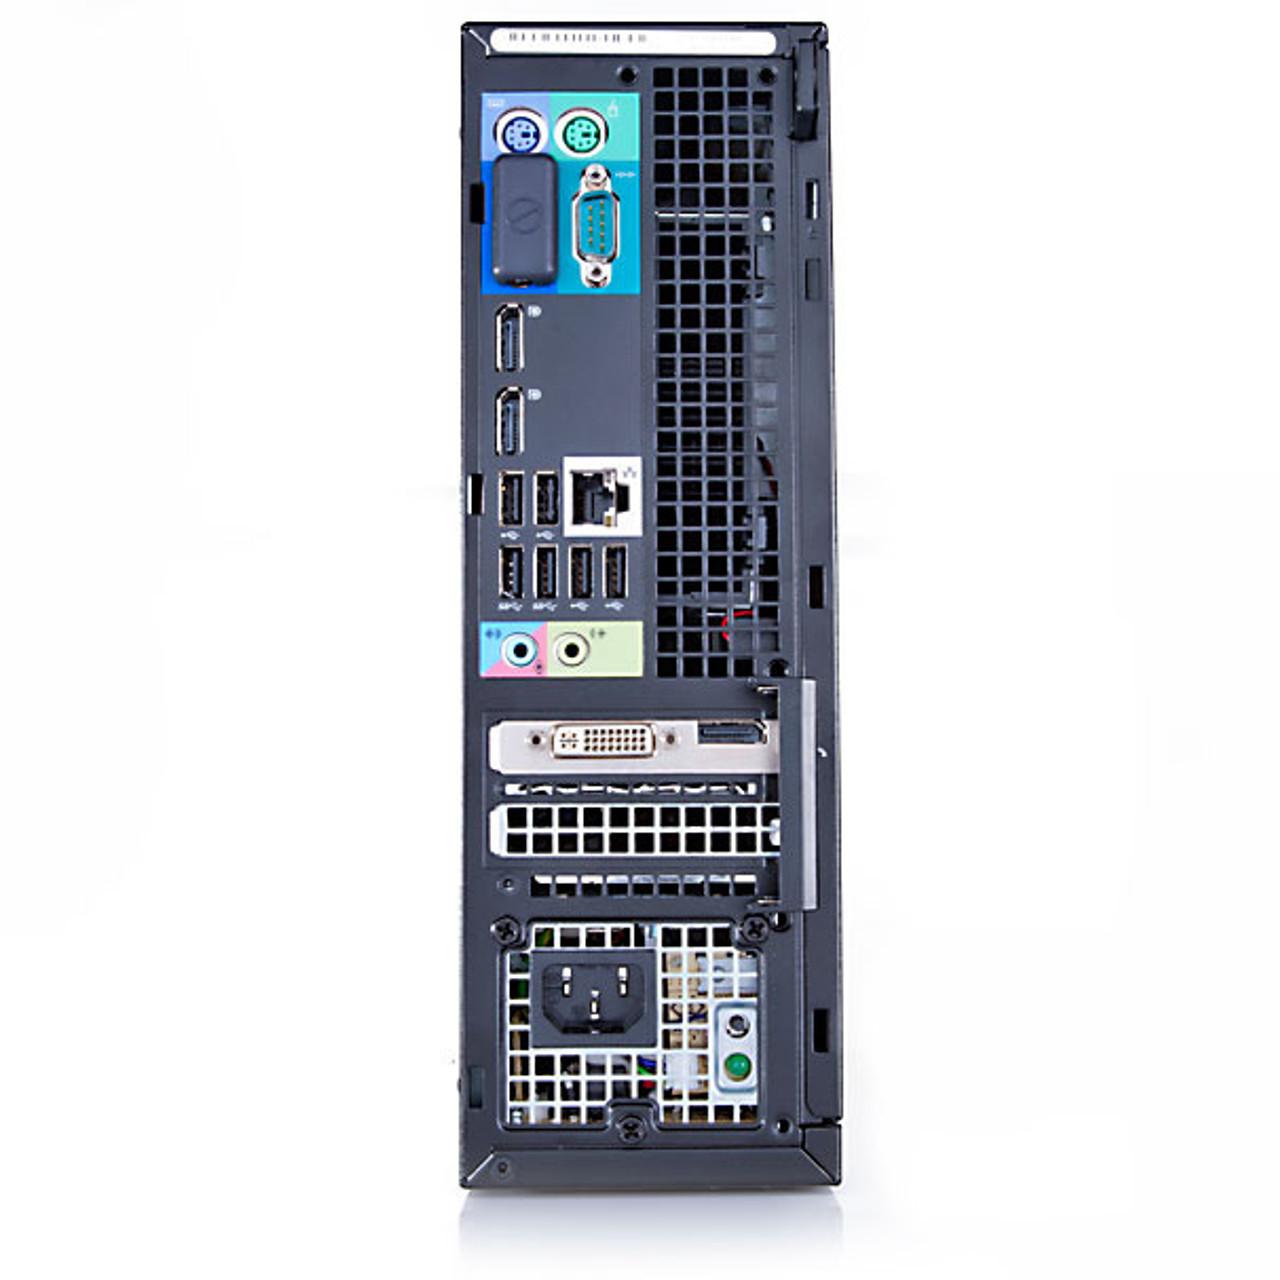 Dell Optiplex 9010 SFF Core i3 3.3GHz, 4GB Ram, 250GB HDD, DVD-RW, Windows 7 Pro 64 Desktop Computer